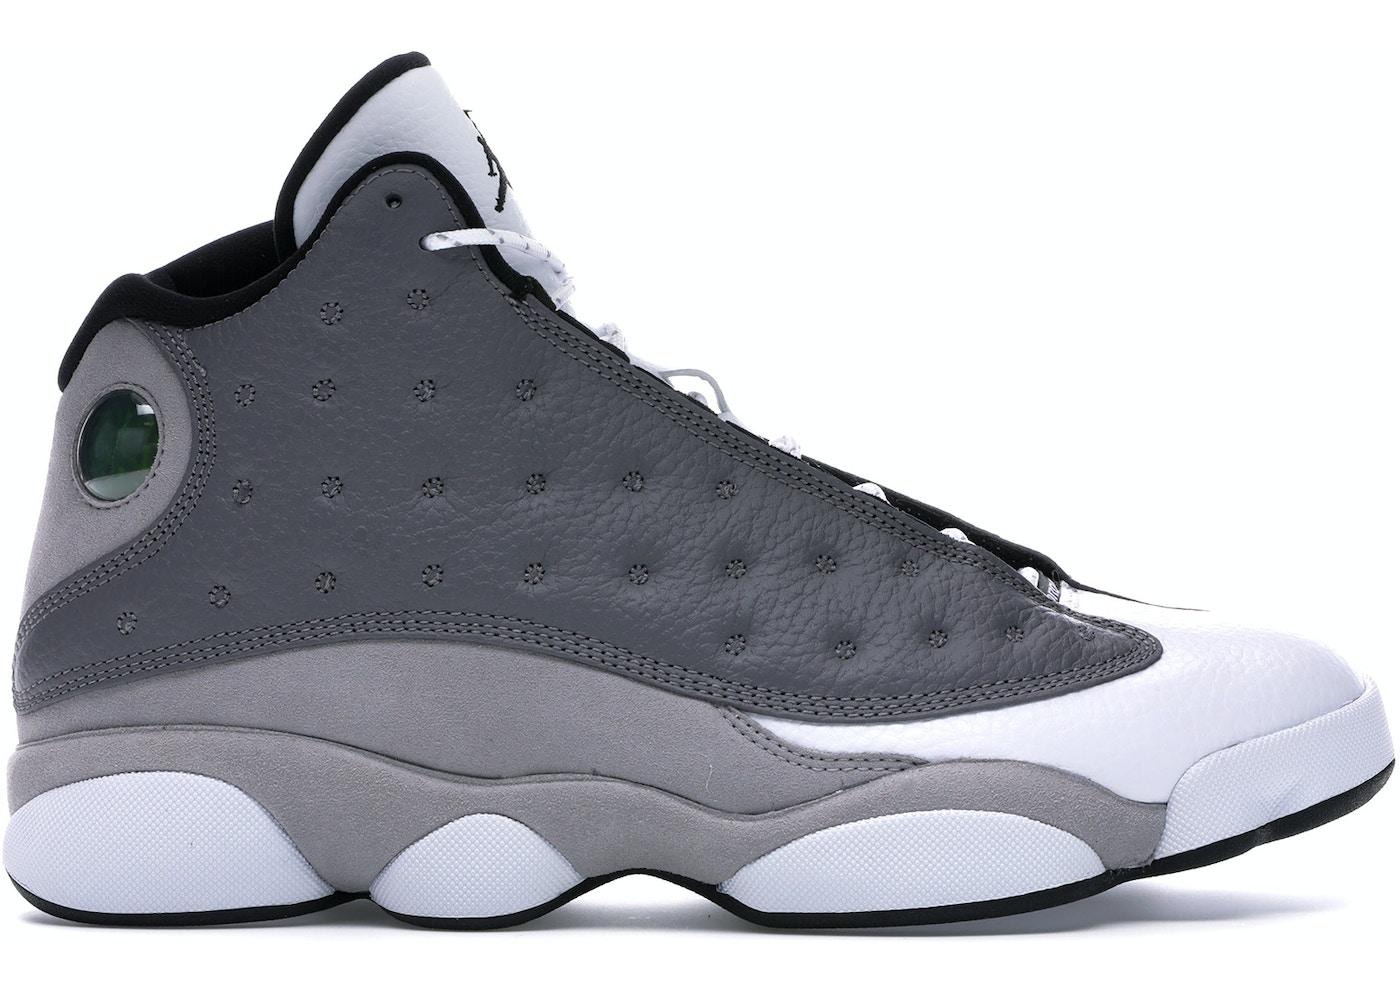 finest selection 9b82f 20ff5 Jordan 13 Retro Atmosphere Grey